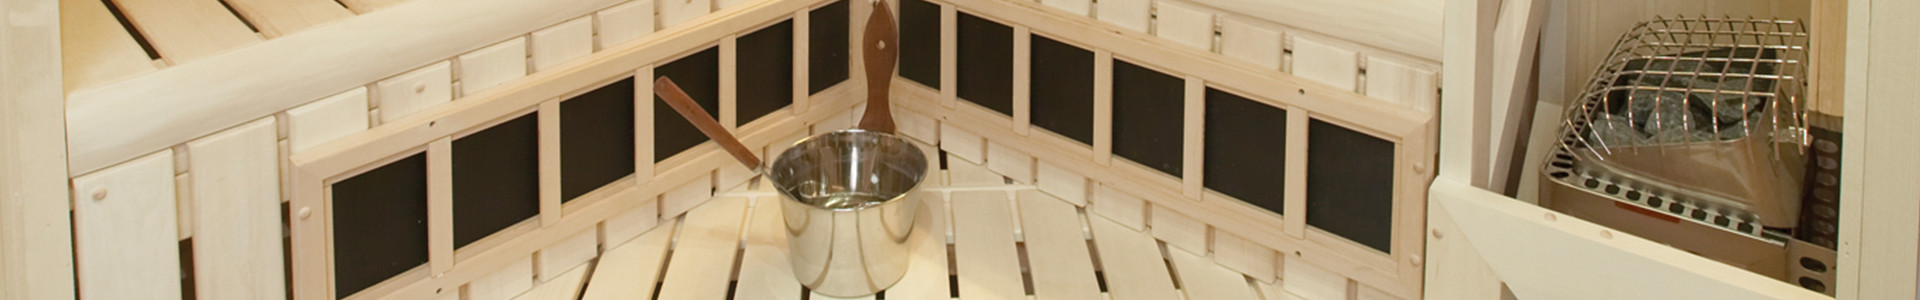 3 Amazing Benefits of Sauna Use, Saunas Maple Grove